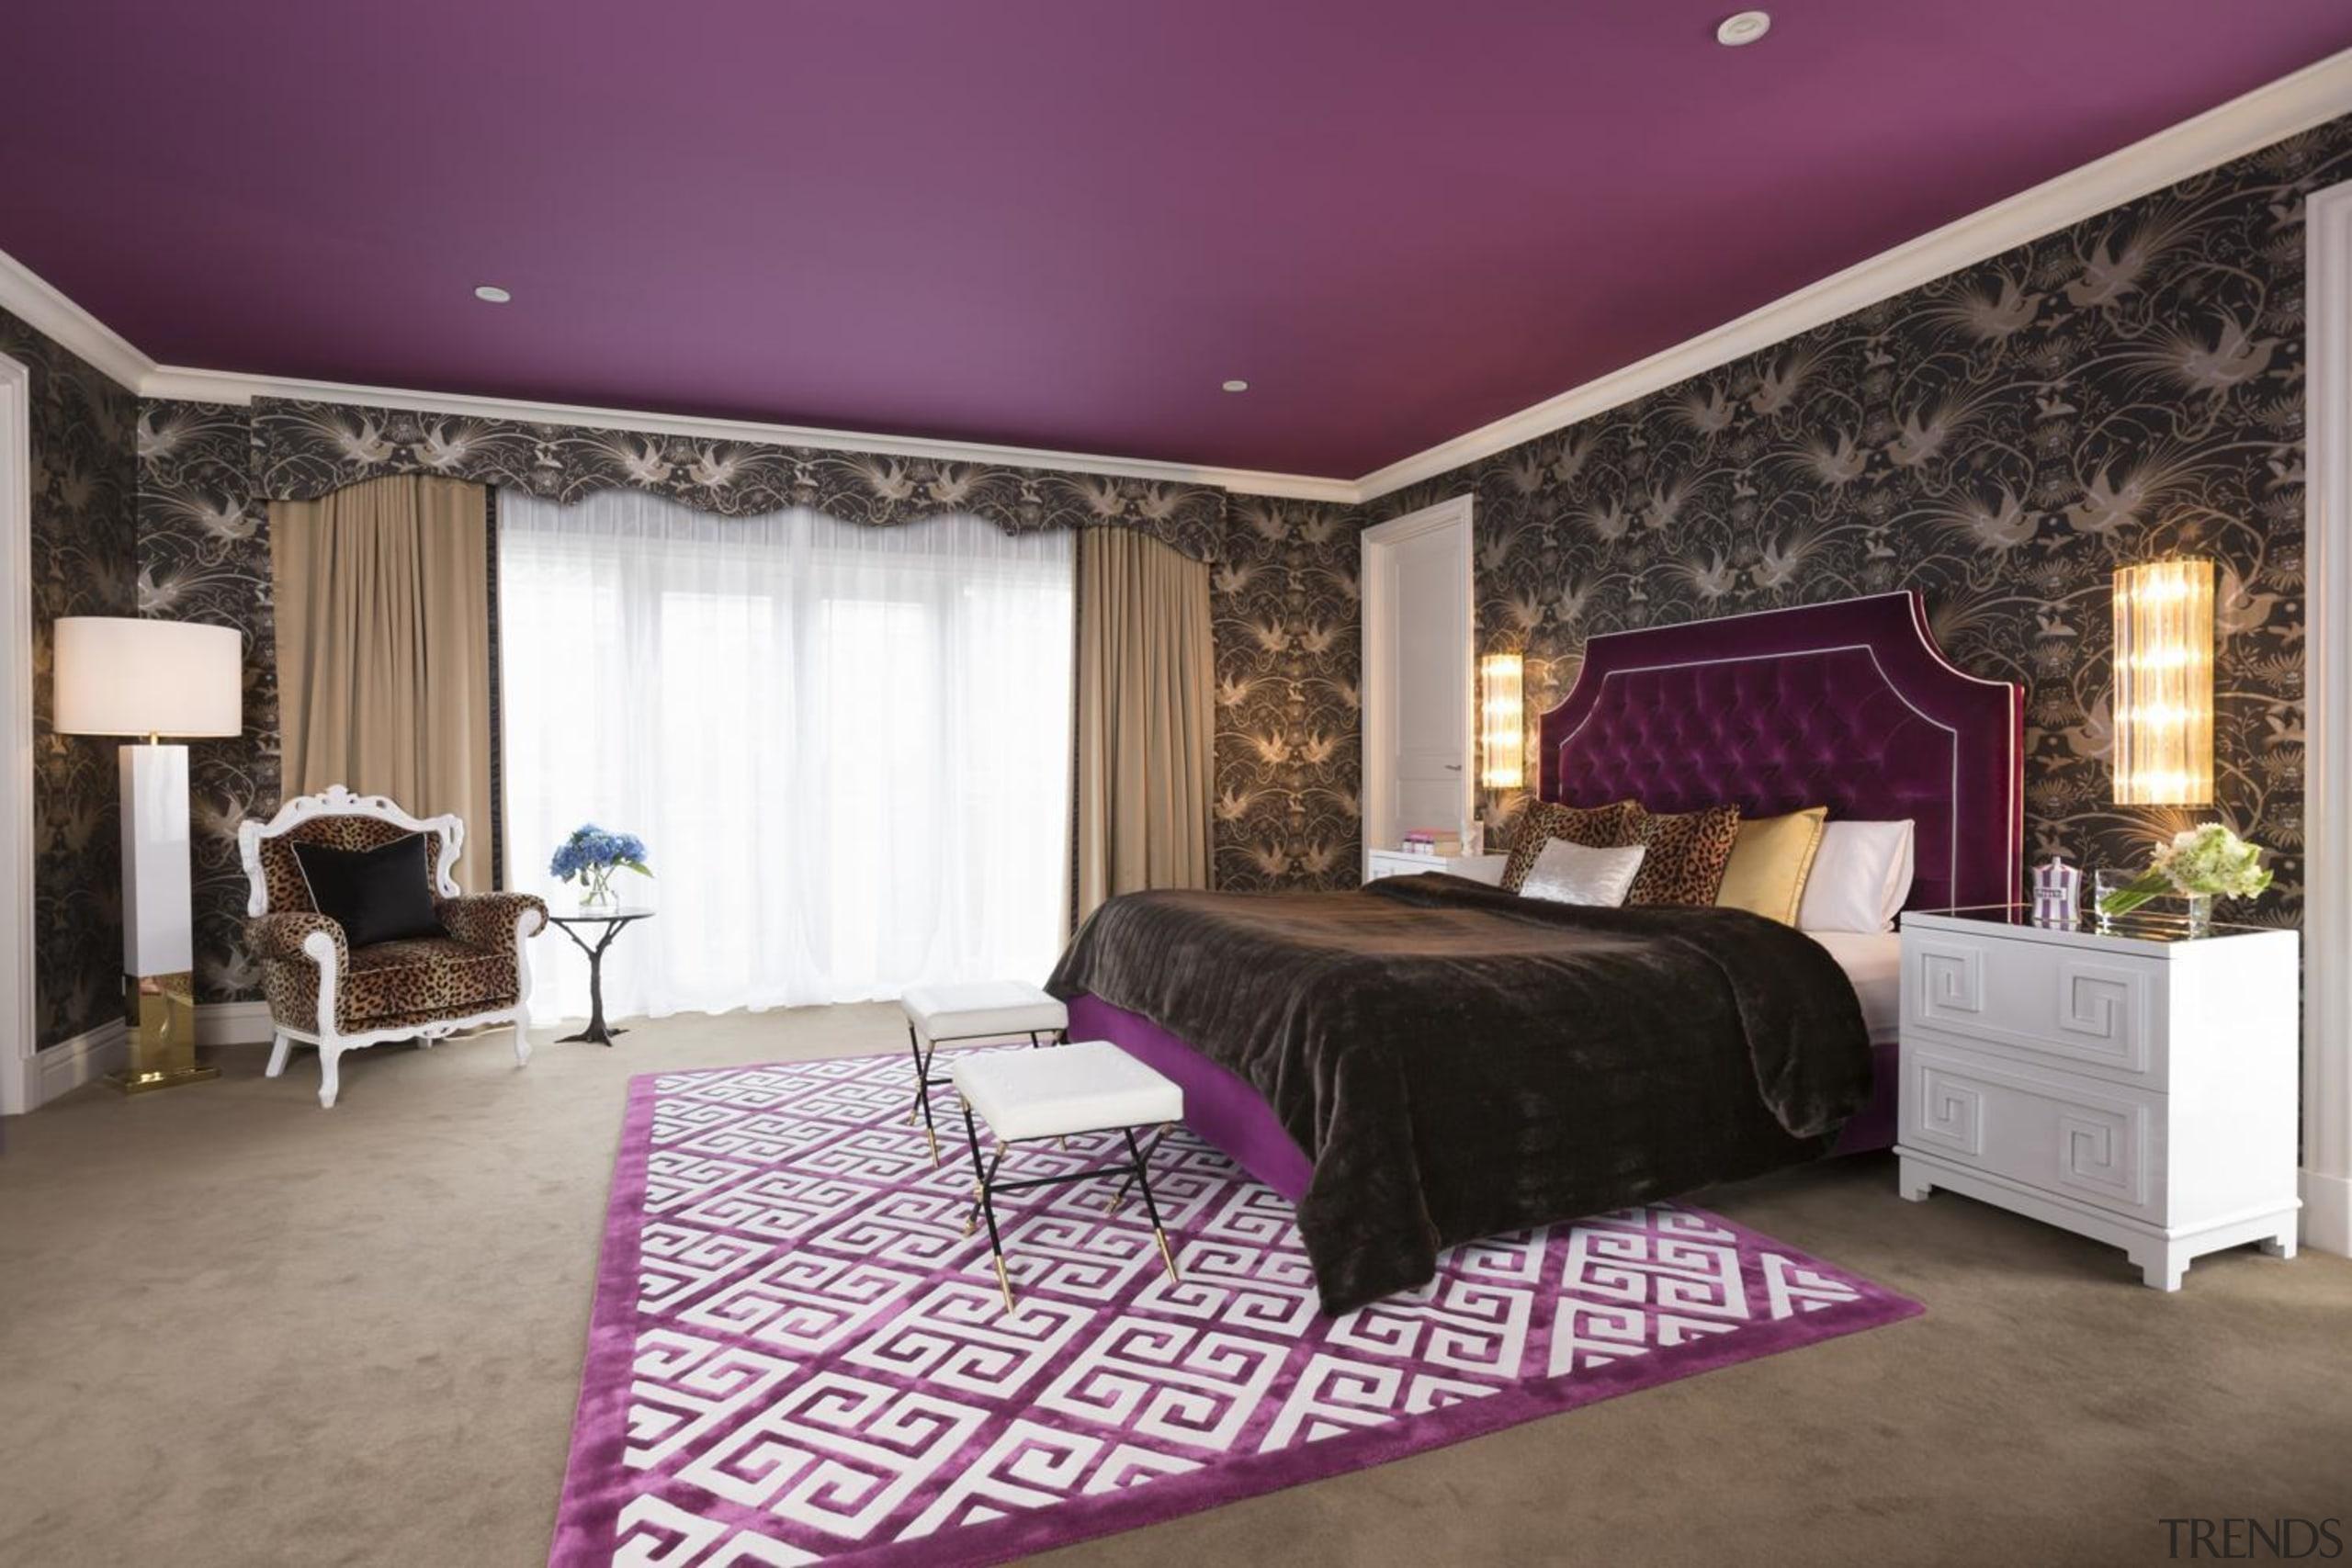 Master Bedroom - bed frame   bedroom   bed frame, bedroom, ceiling, floor, furniture, home, interior design, living room, property, purple, real estate, room, suite, wall, window treatment